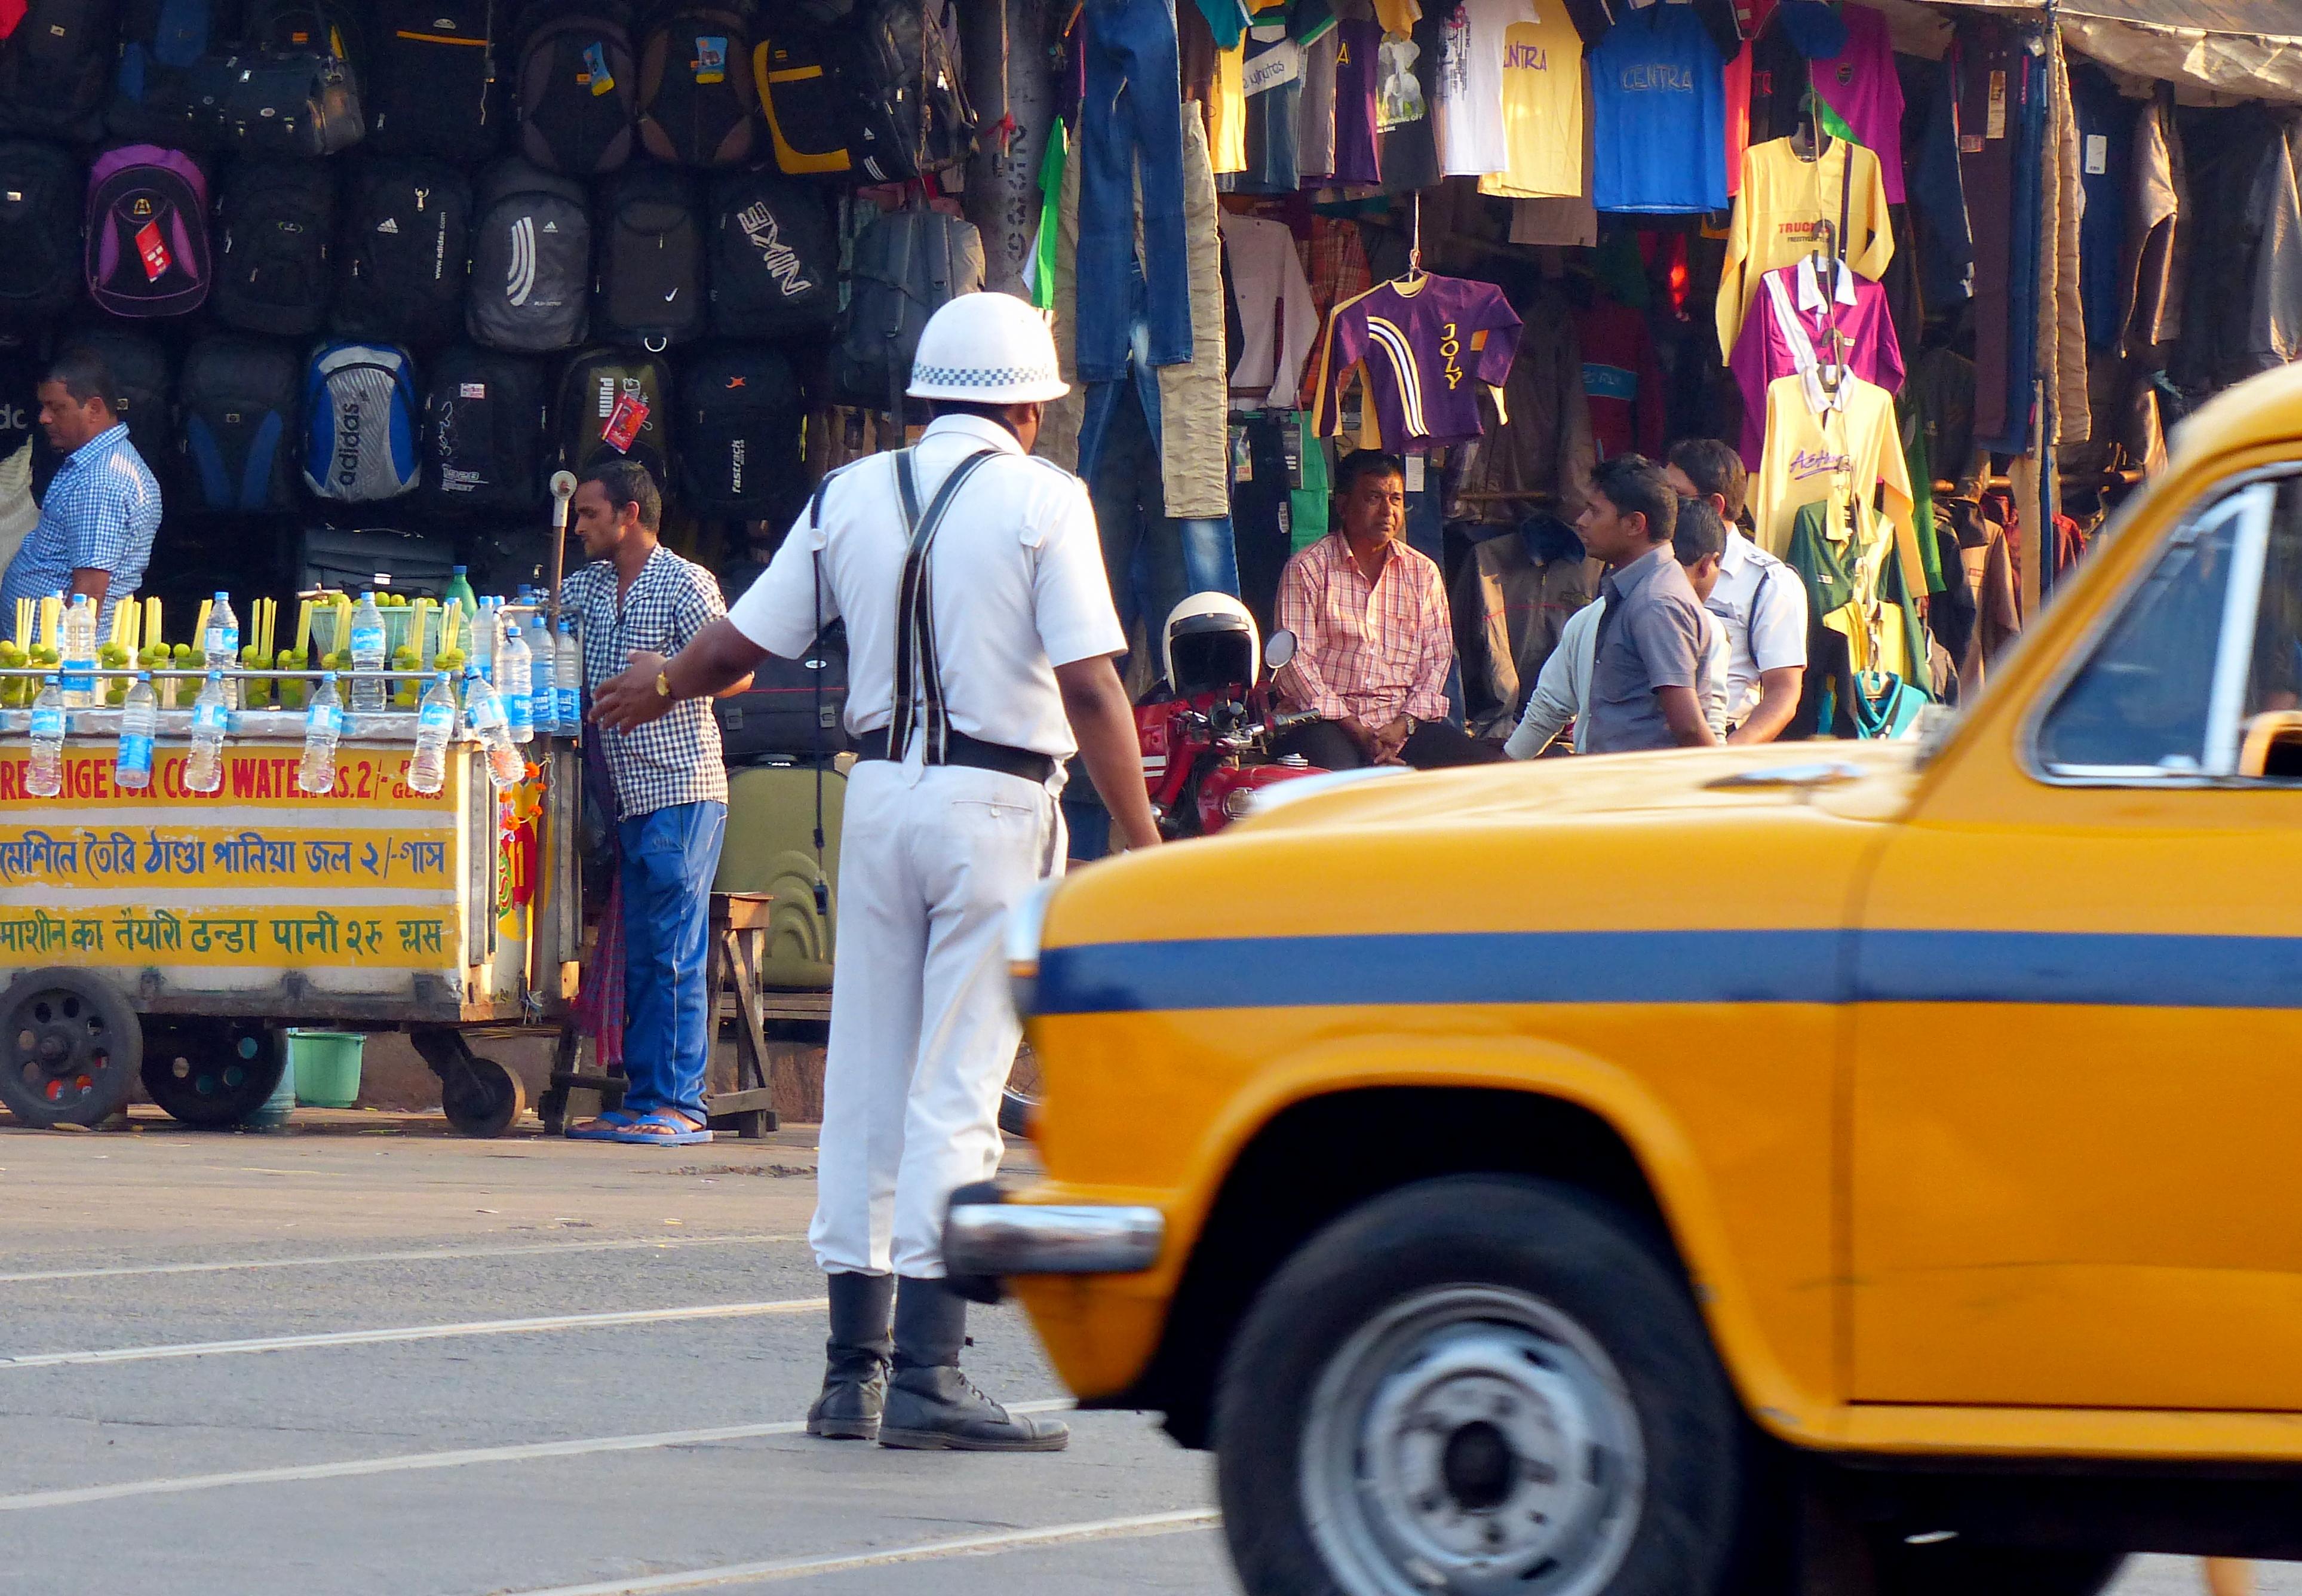 Kolkata Traffic Police Photos  Concave Image Upside Down